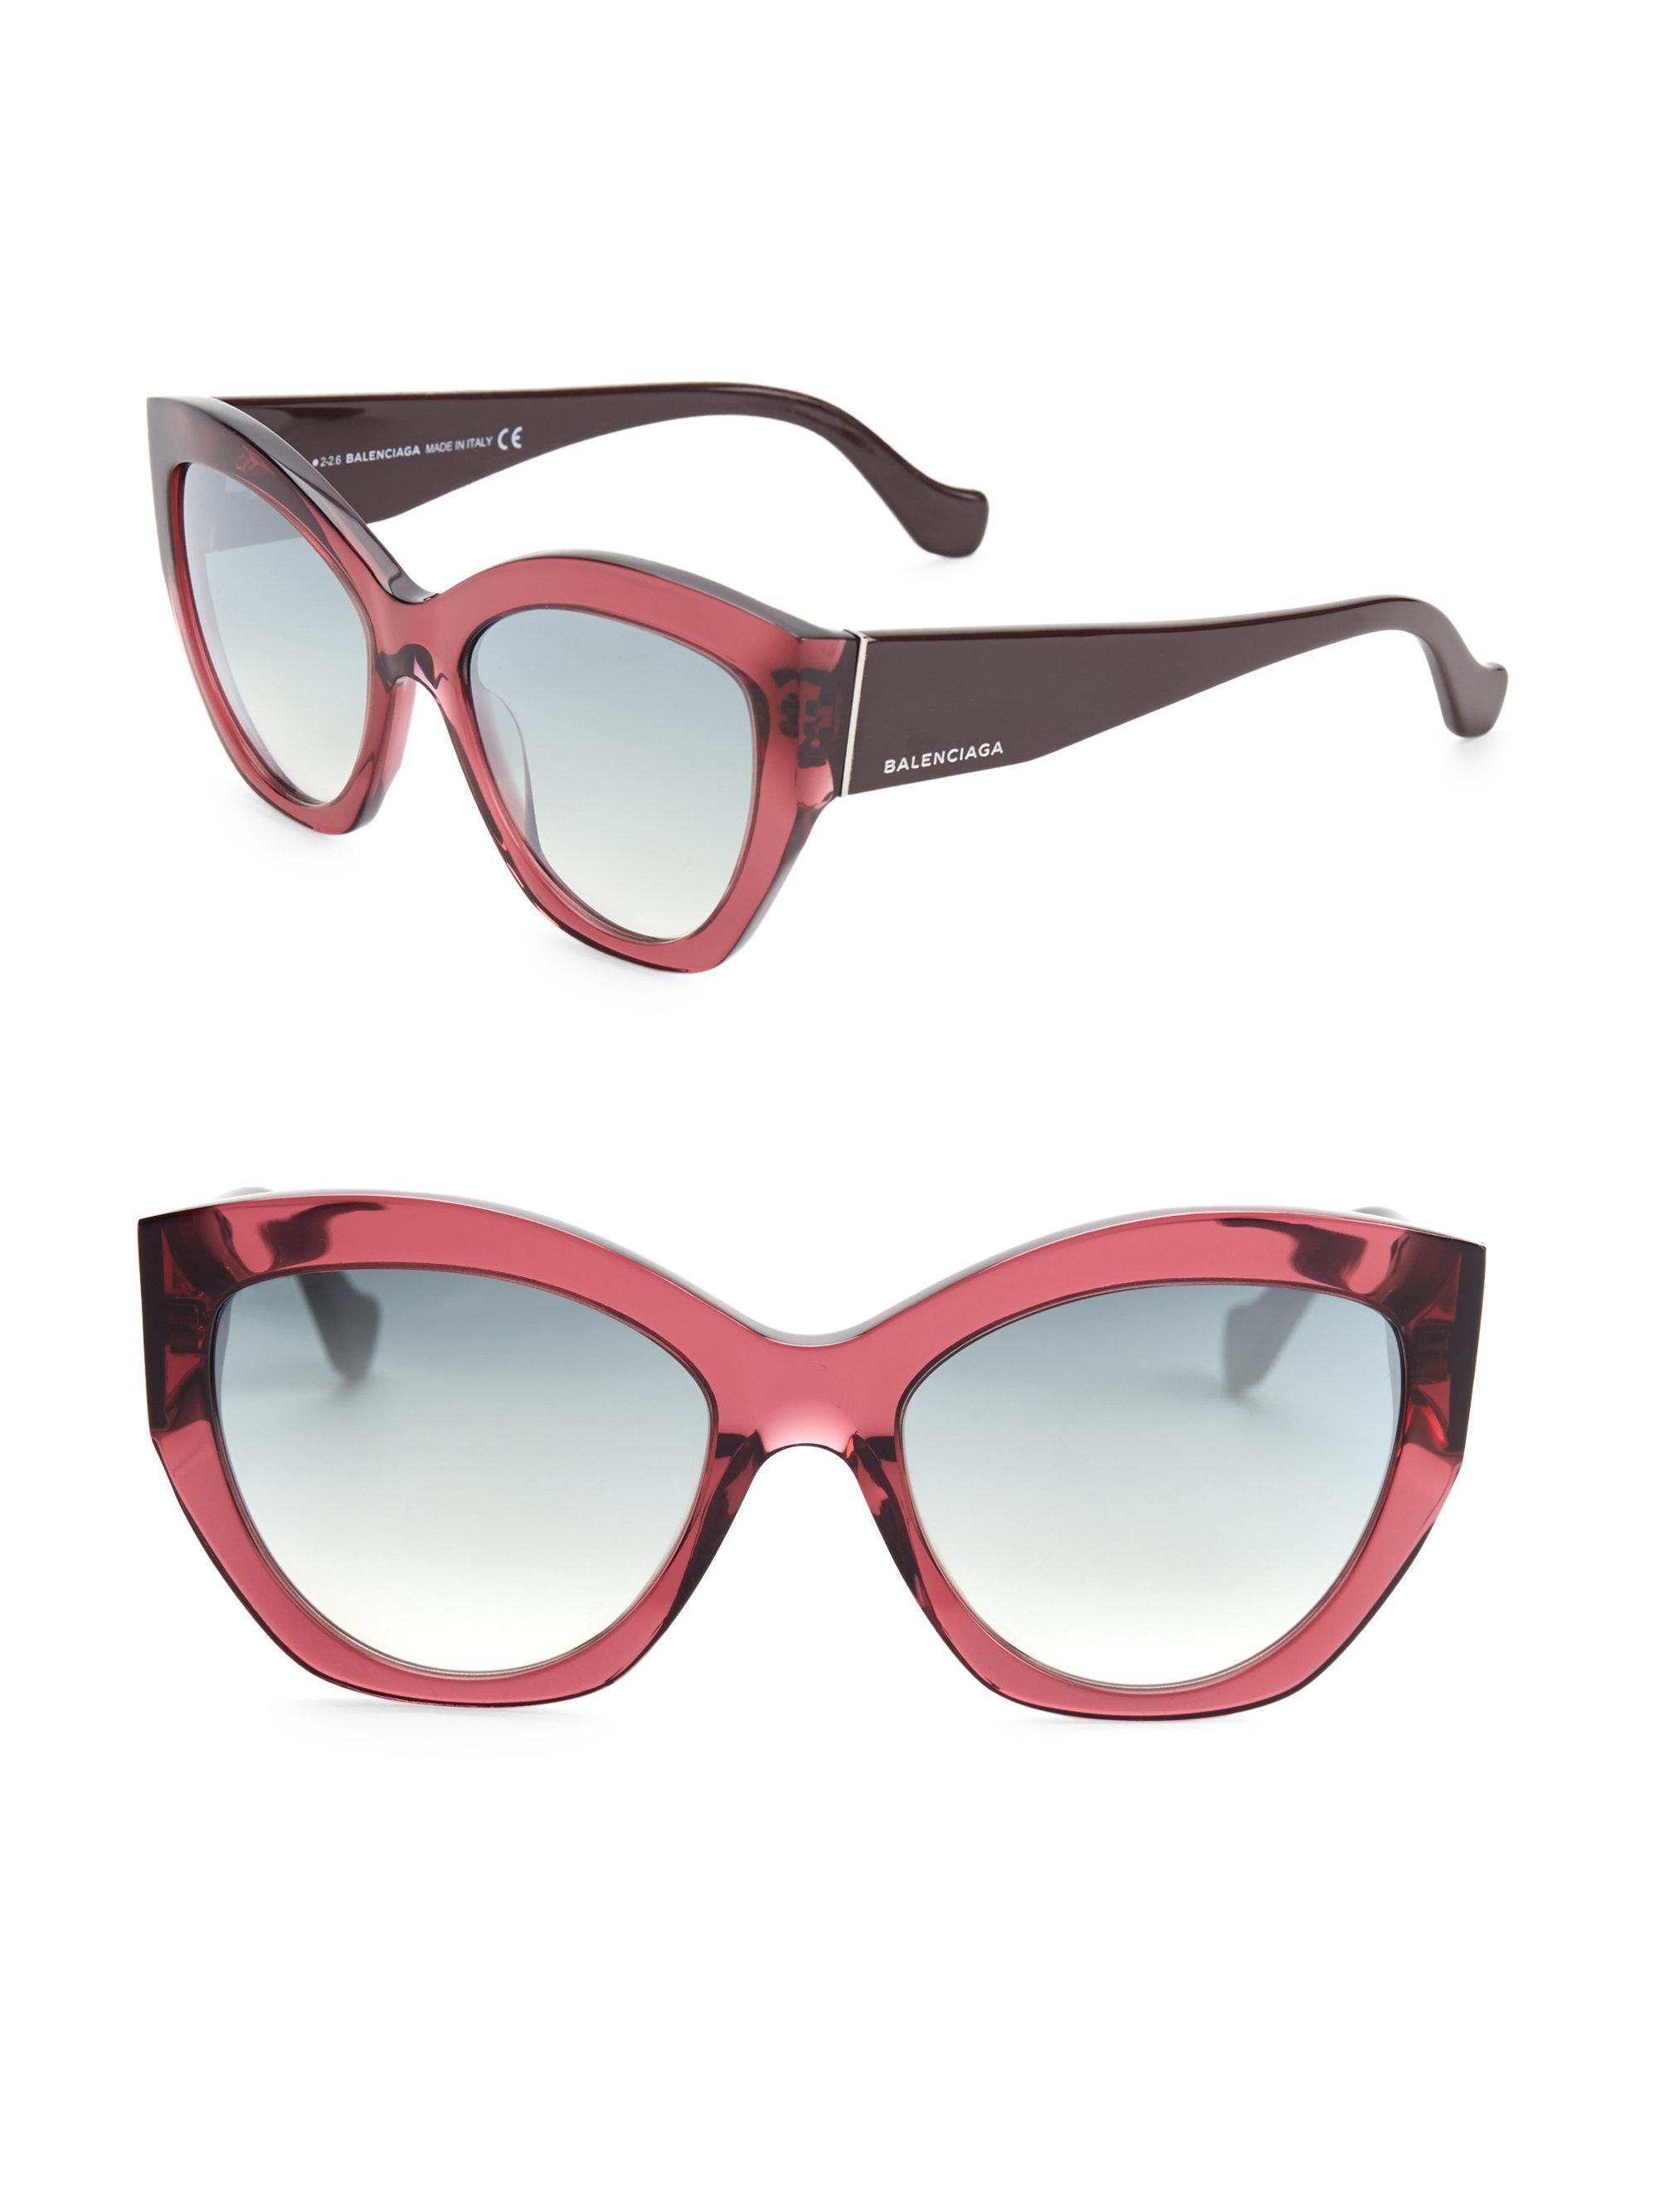 805d92fd1a Lyst - Balenciaga 56mm Mirrored Cat Eye Sunglasses